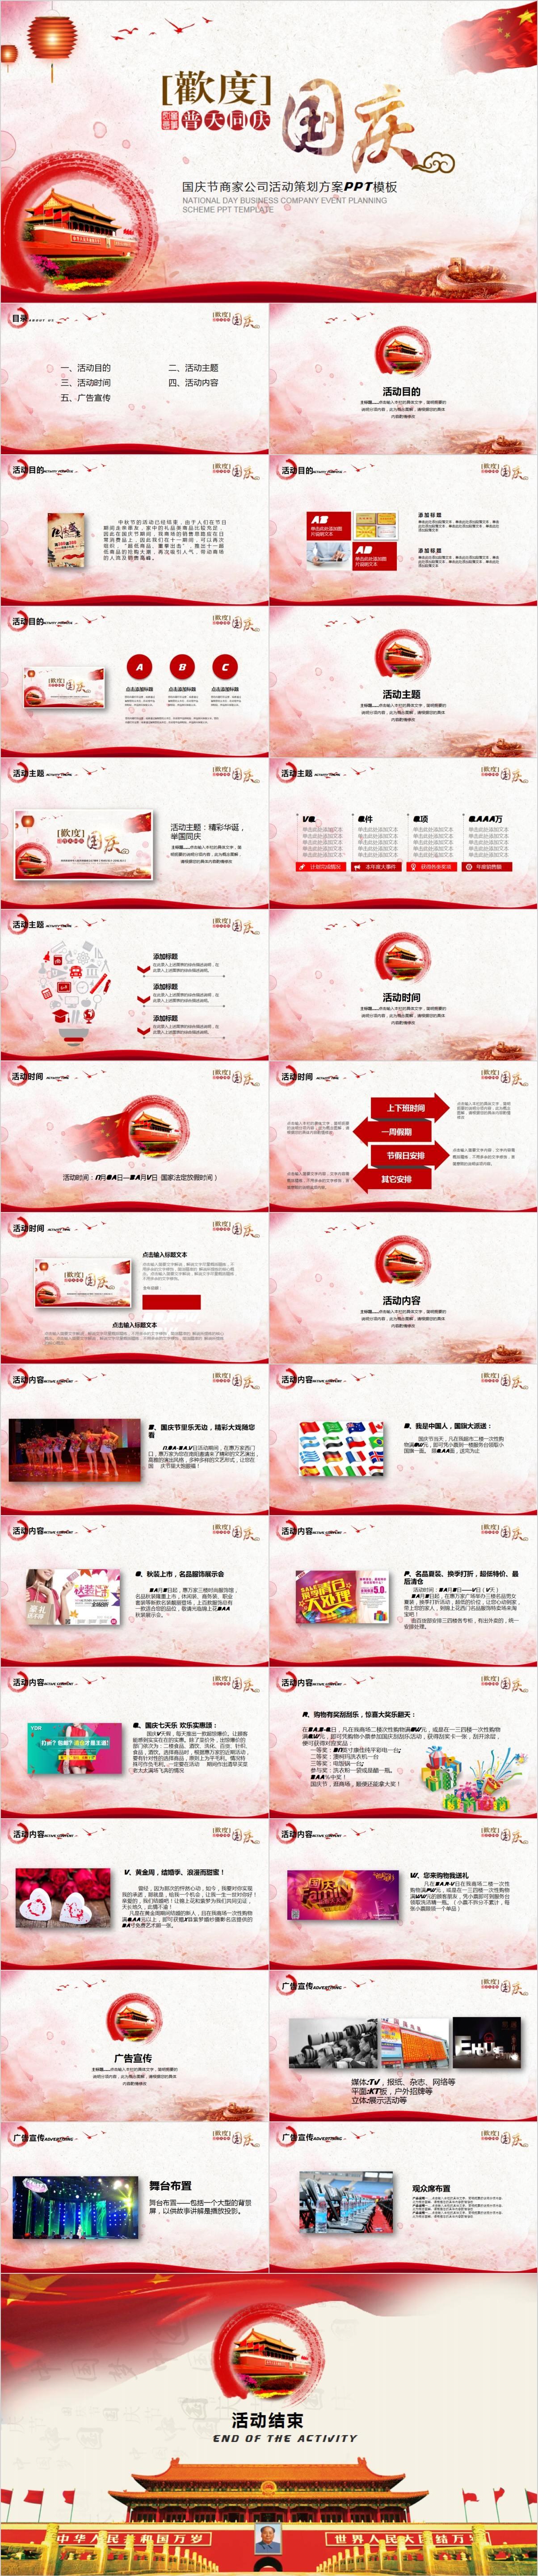 CL0049 国庆节商家公司活动策划方案PPT模板